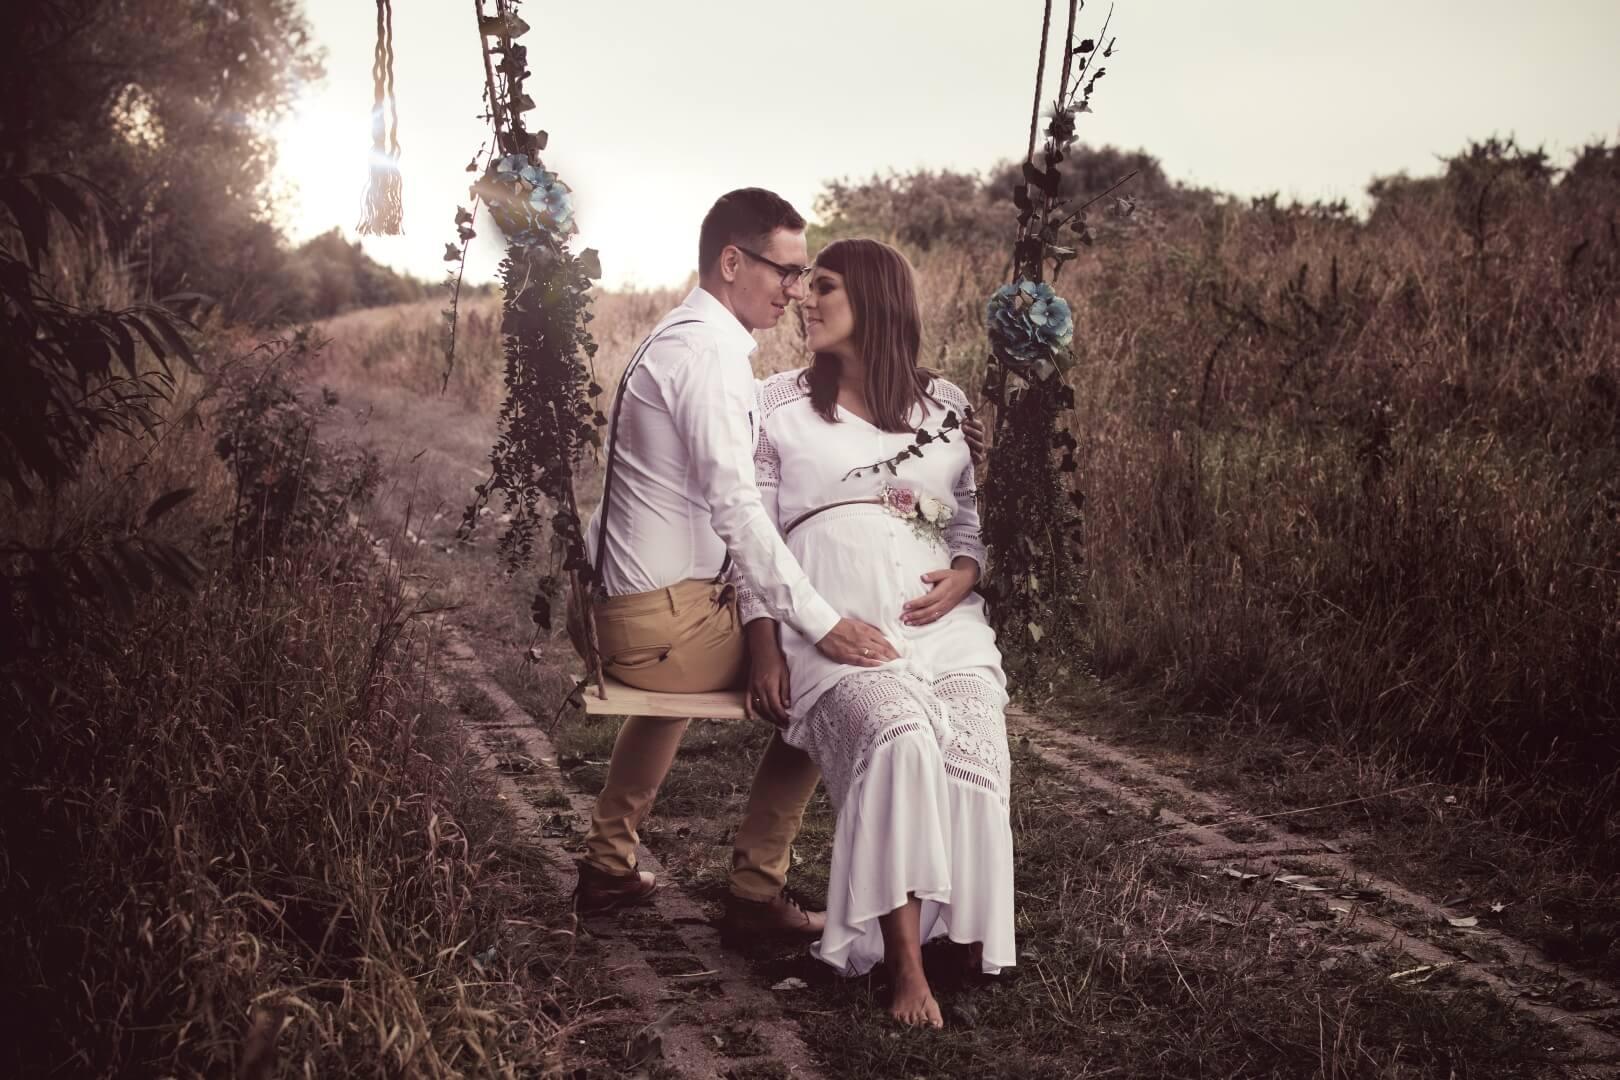 Zdjęcie ciążowe na huśtawce 03